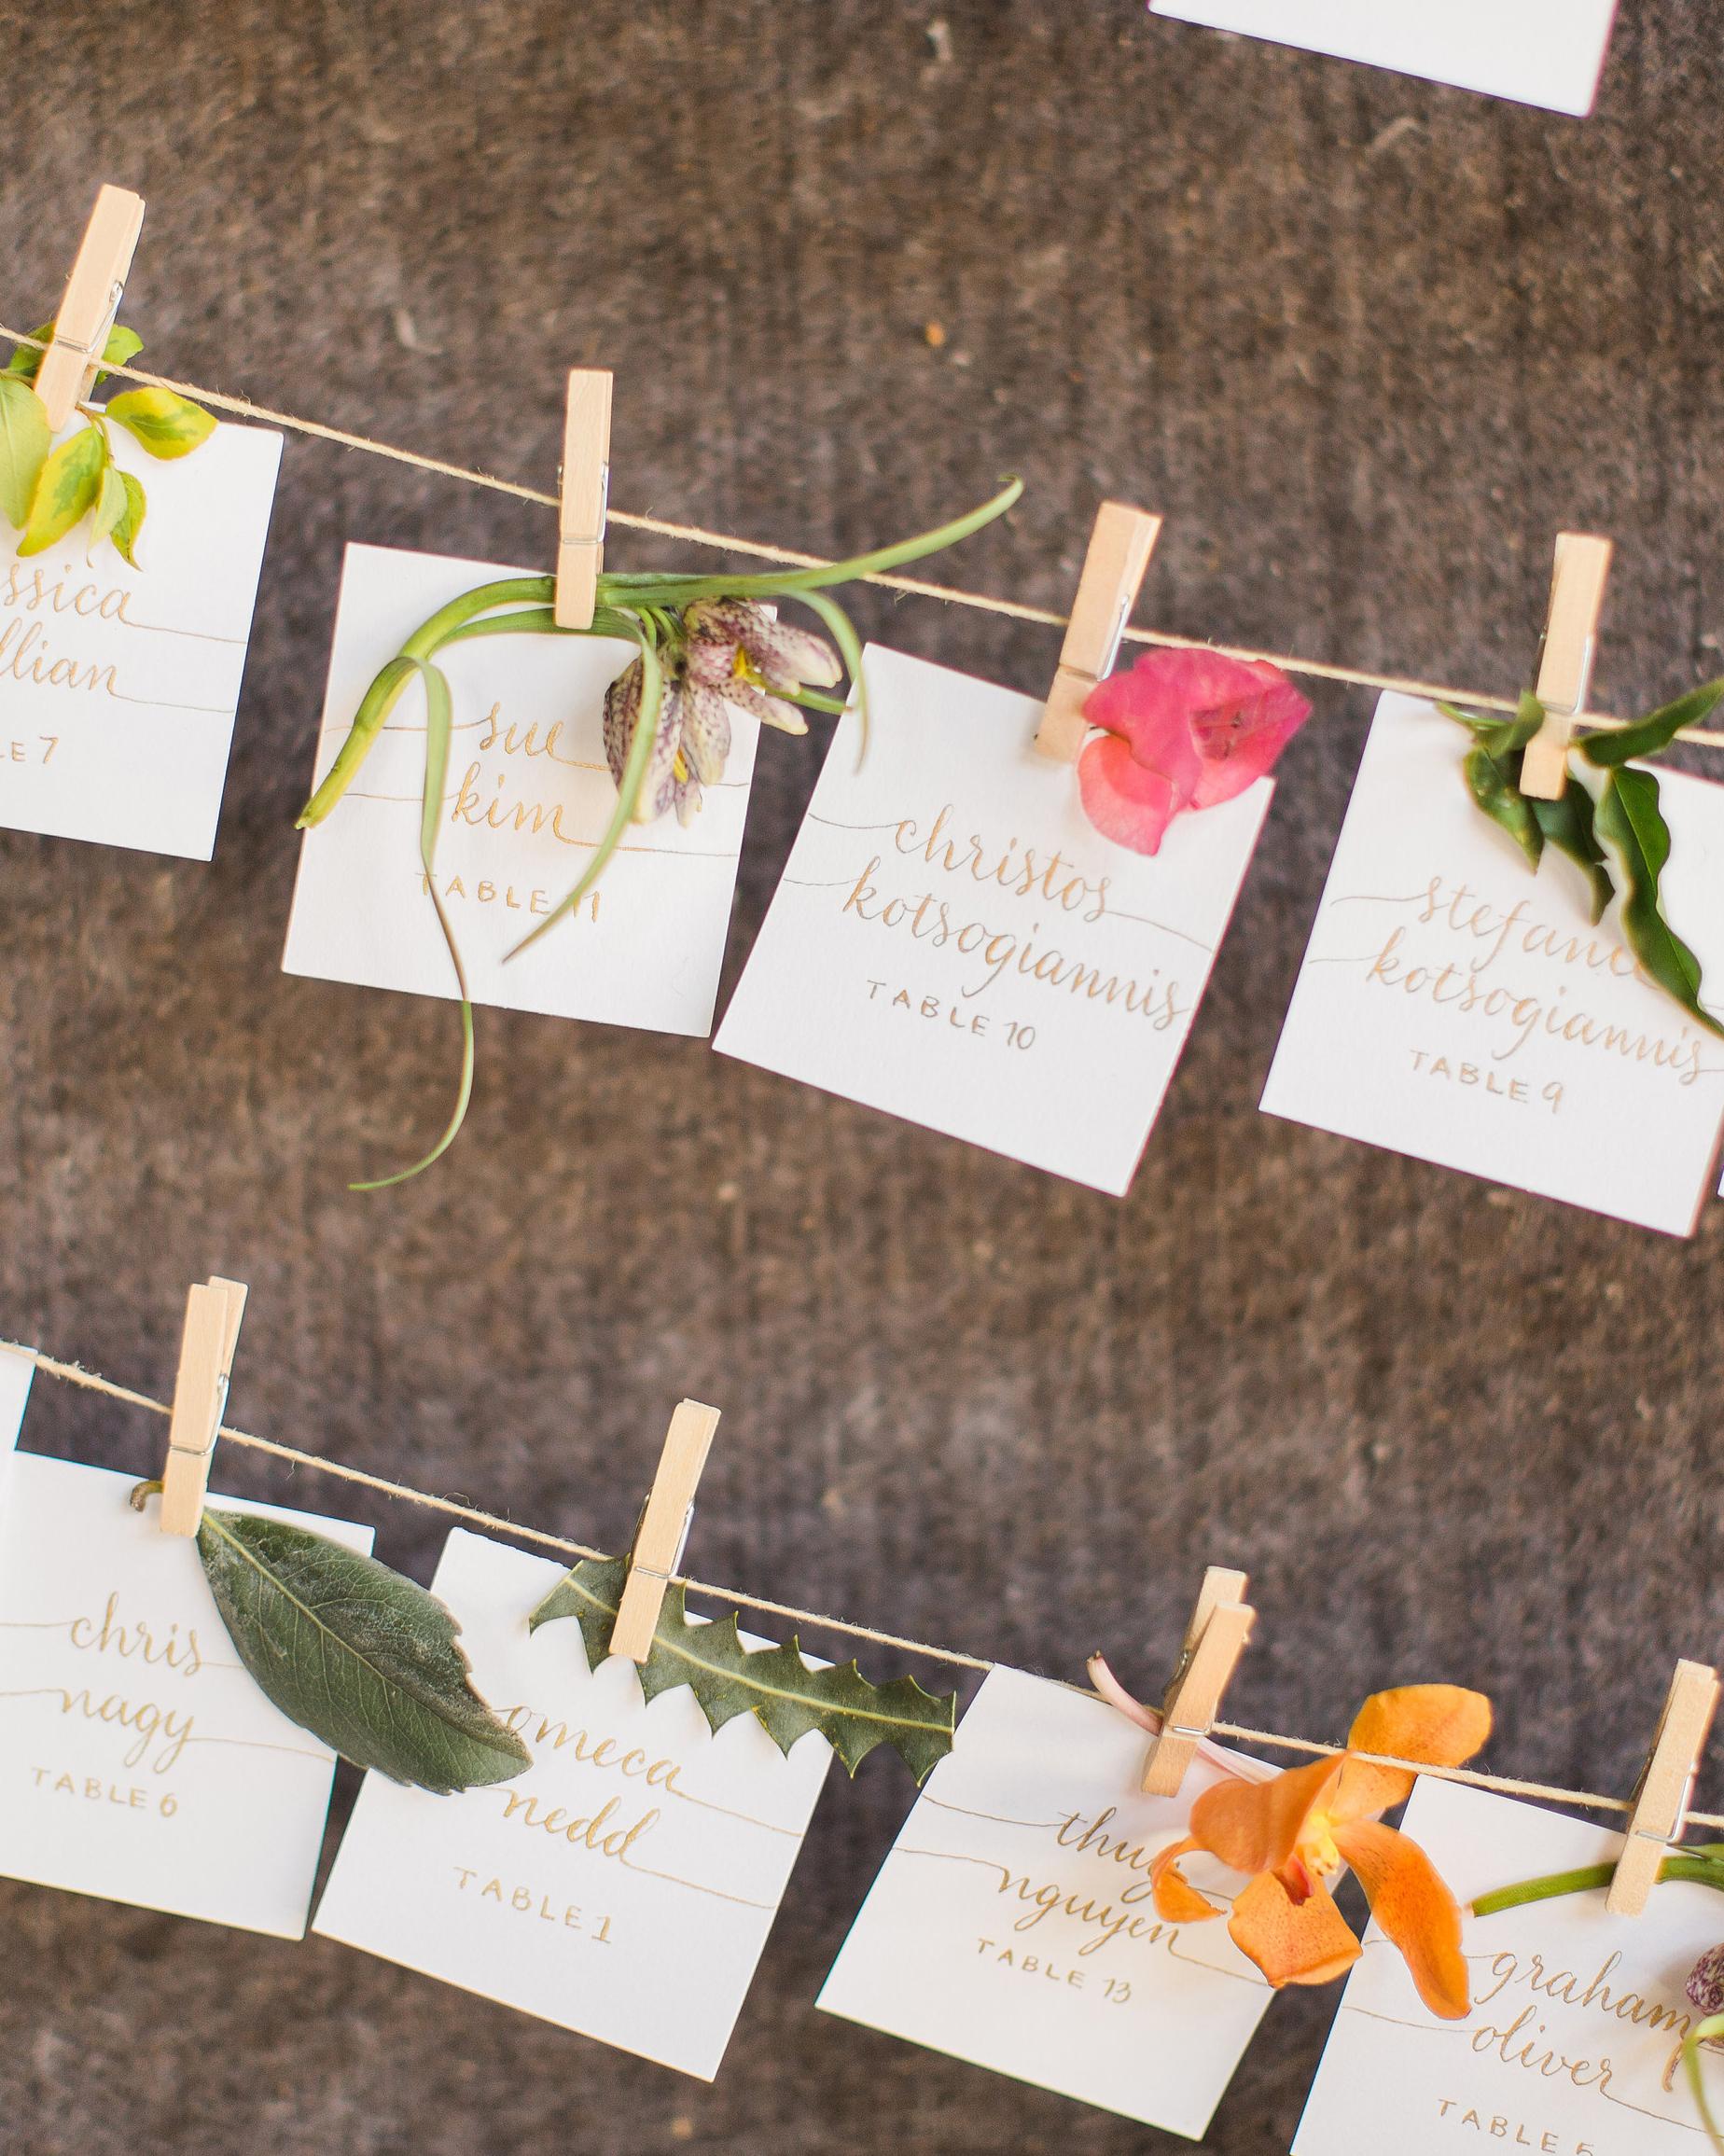 lara-chad-wedding-escortcards-188-s112306-1115.jpg